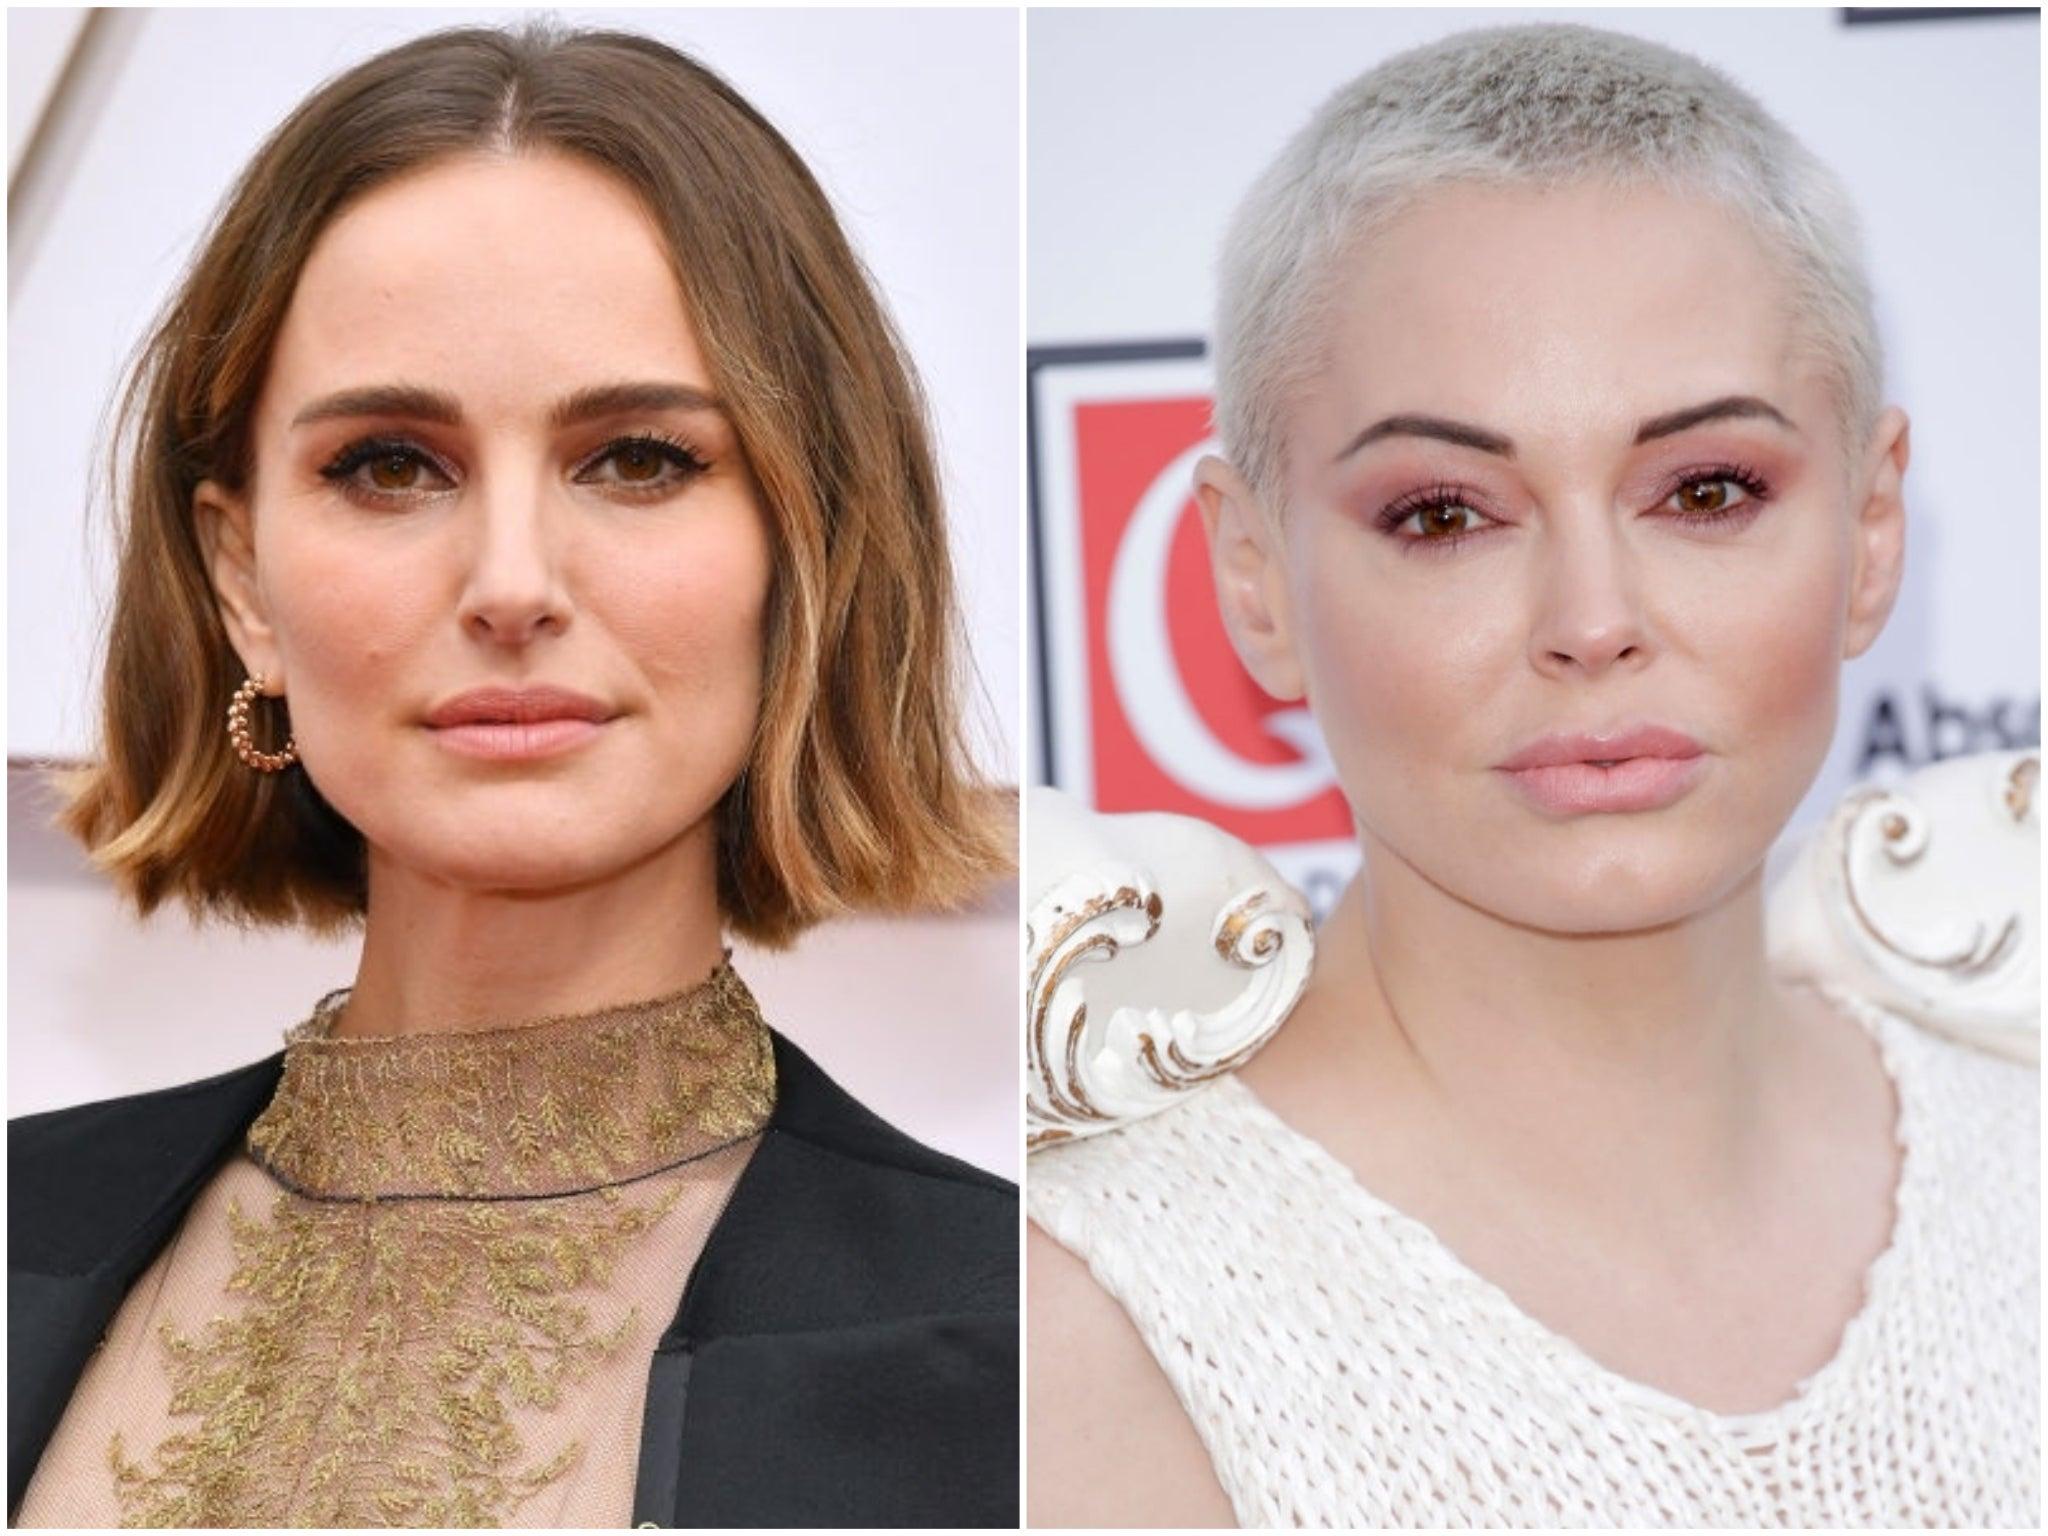 Natalie Portman responds to Rose McGowan's criticism of her feminist Oscars dress